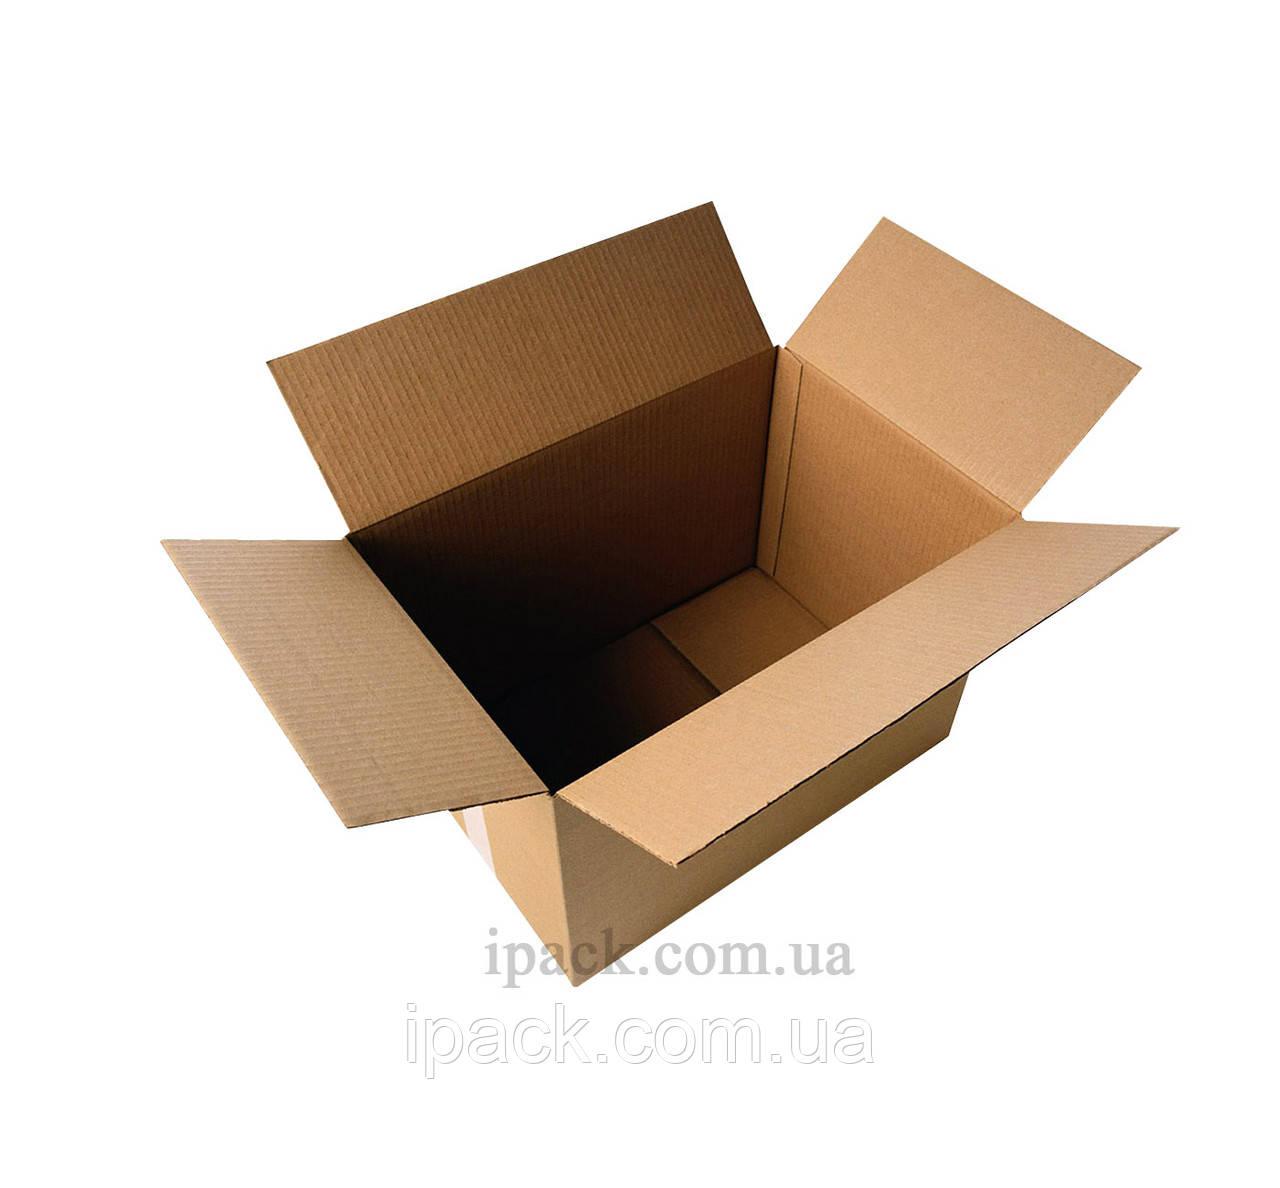 Гофроящик 255*240*240 мм, бурый, четырехклапанный картонный короб